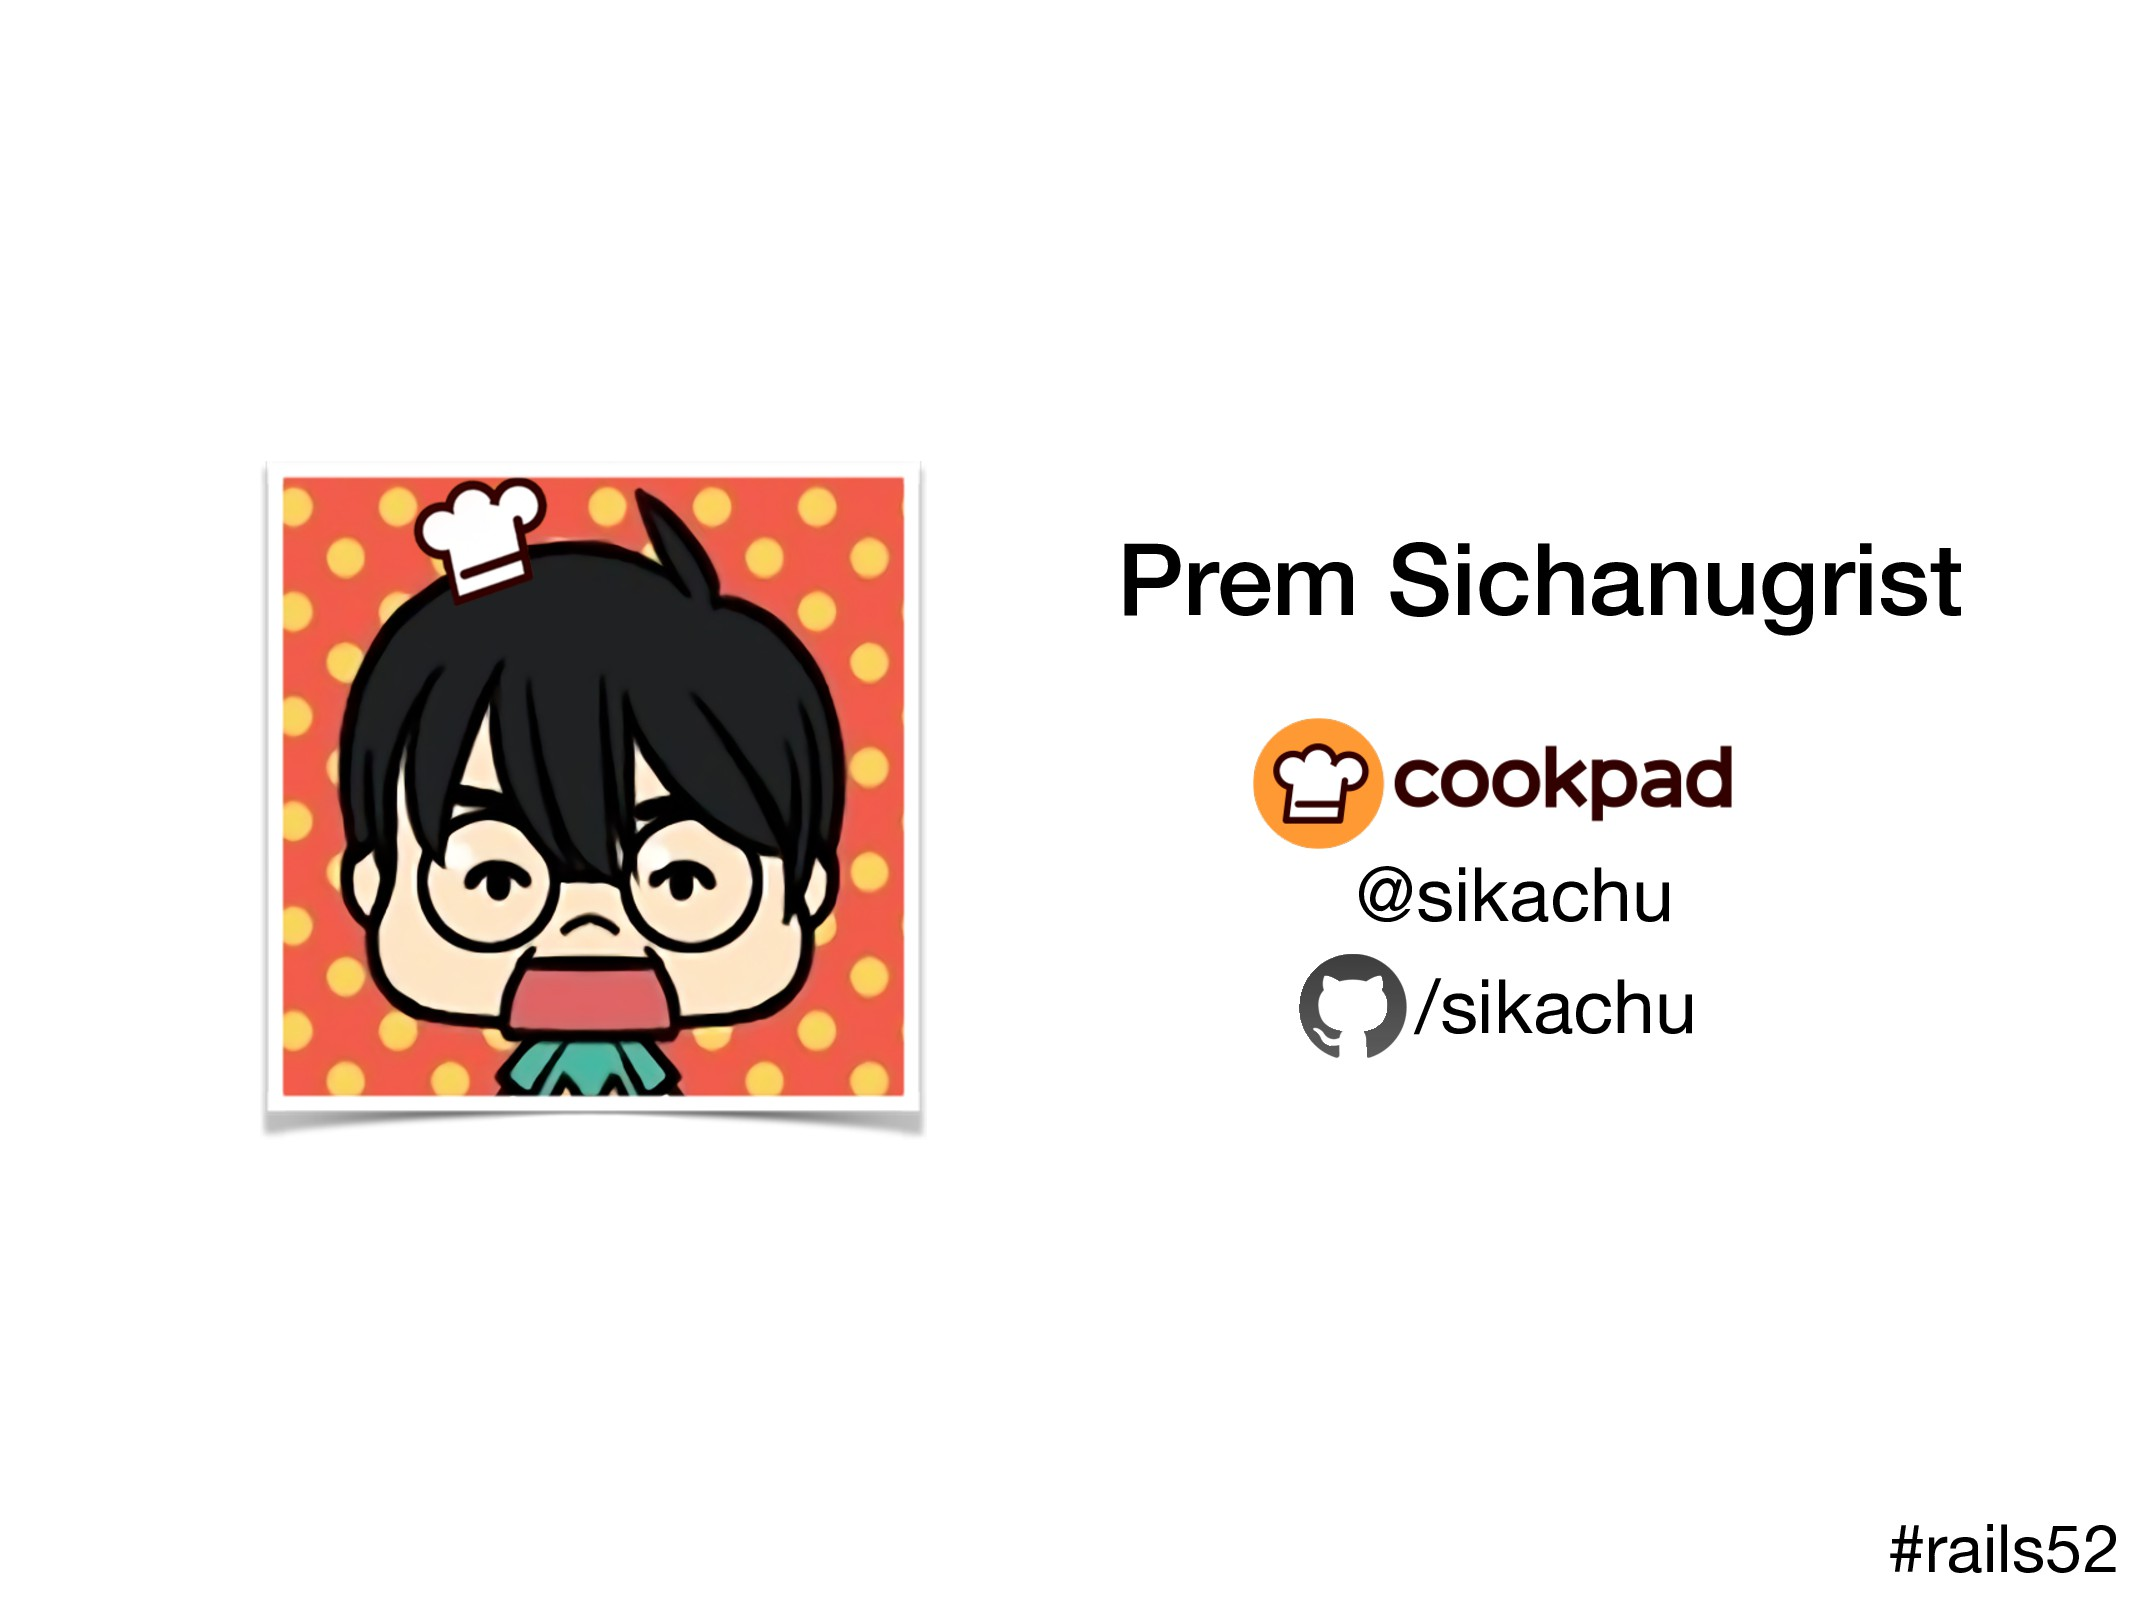 Prem Sichanugrist @sikachu  /sikachu #rails52